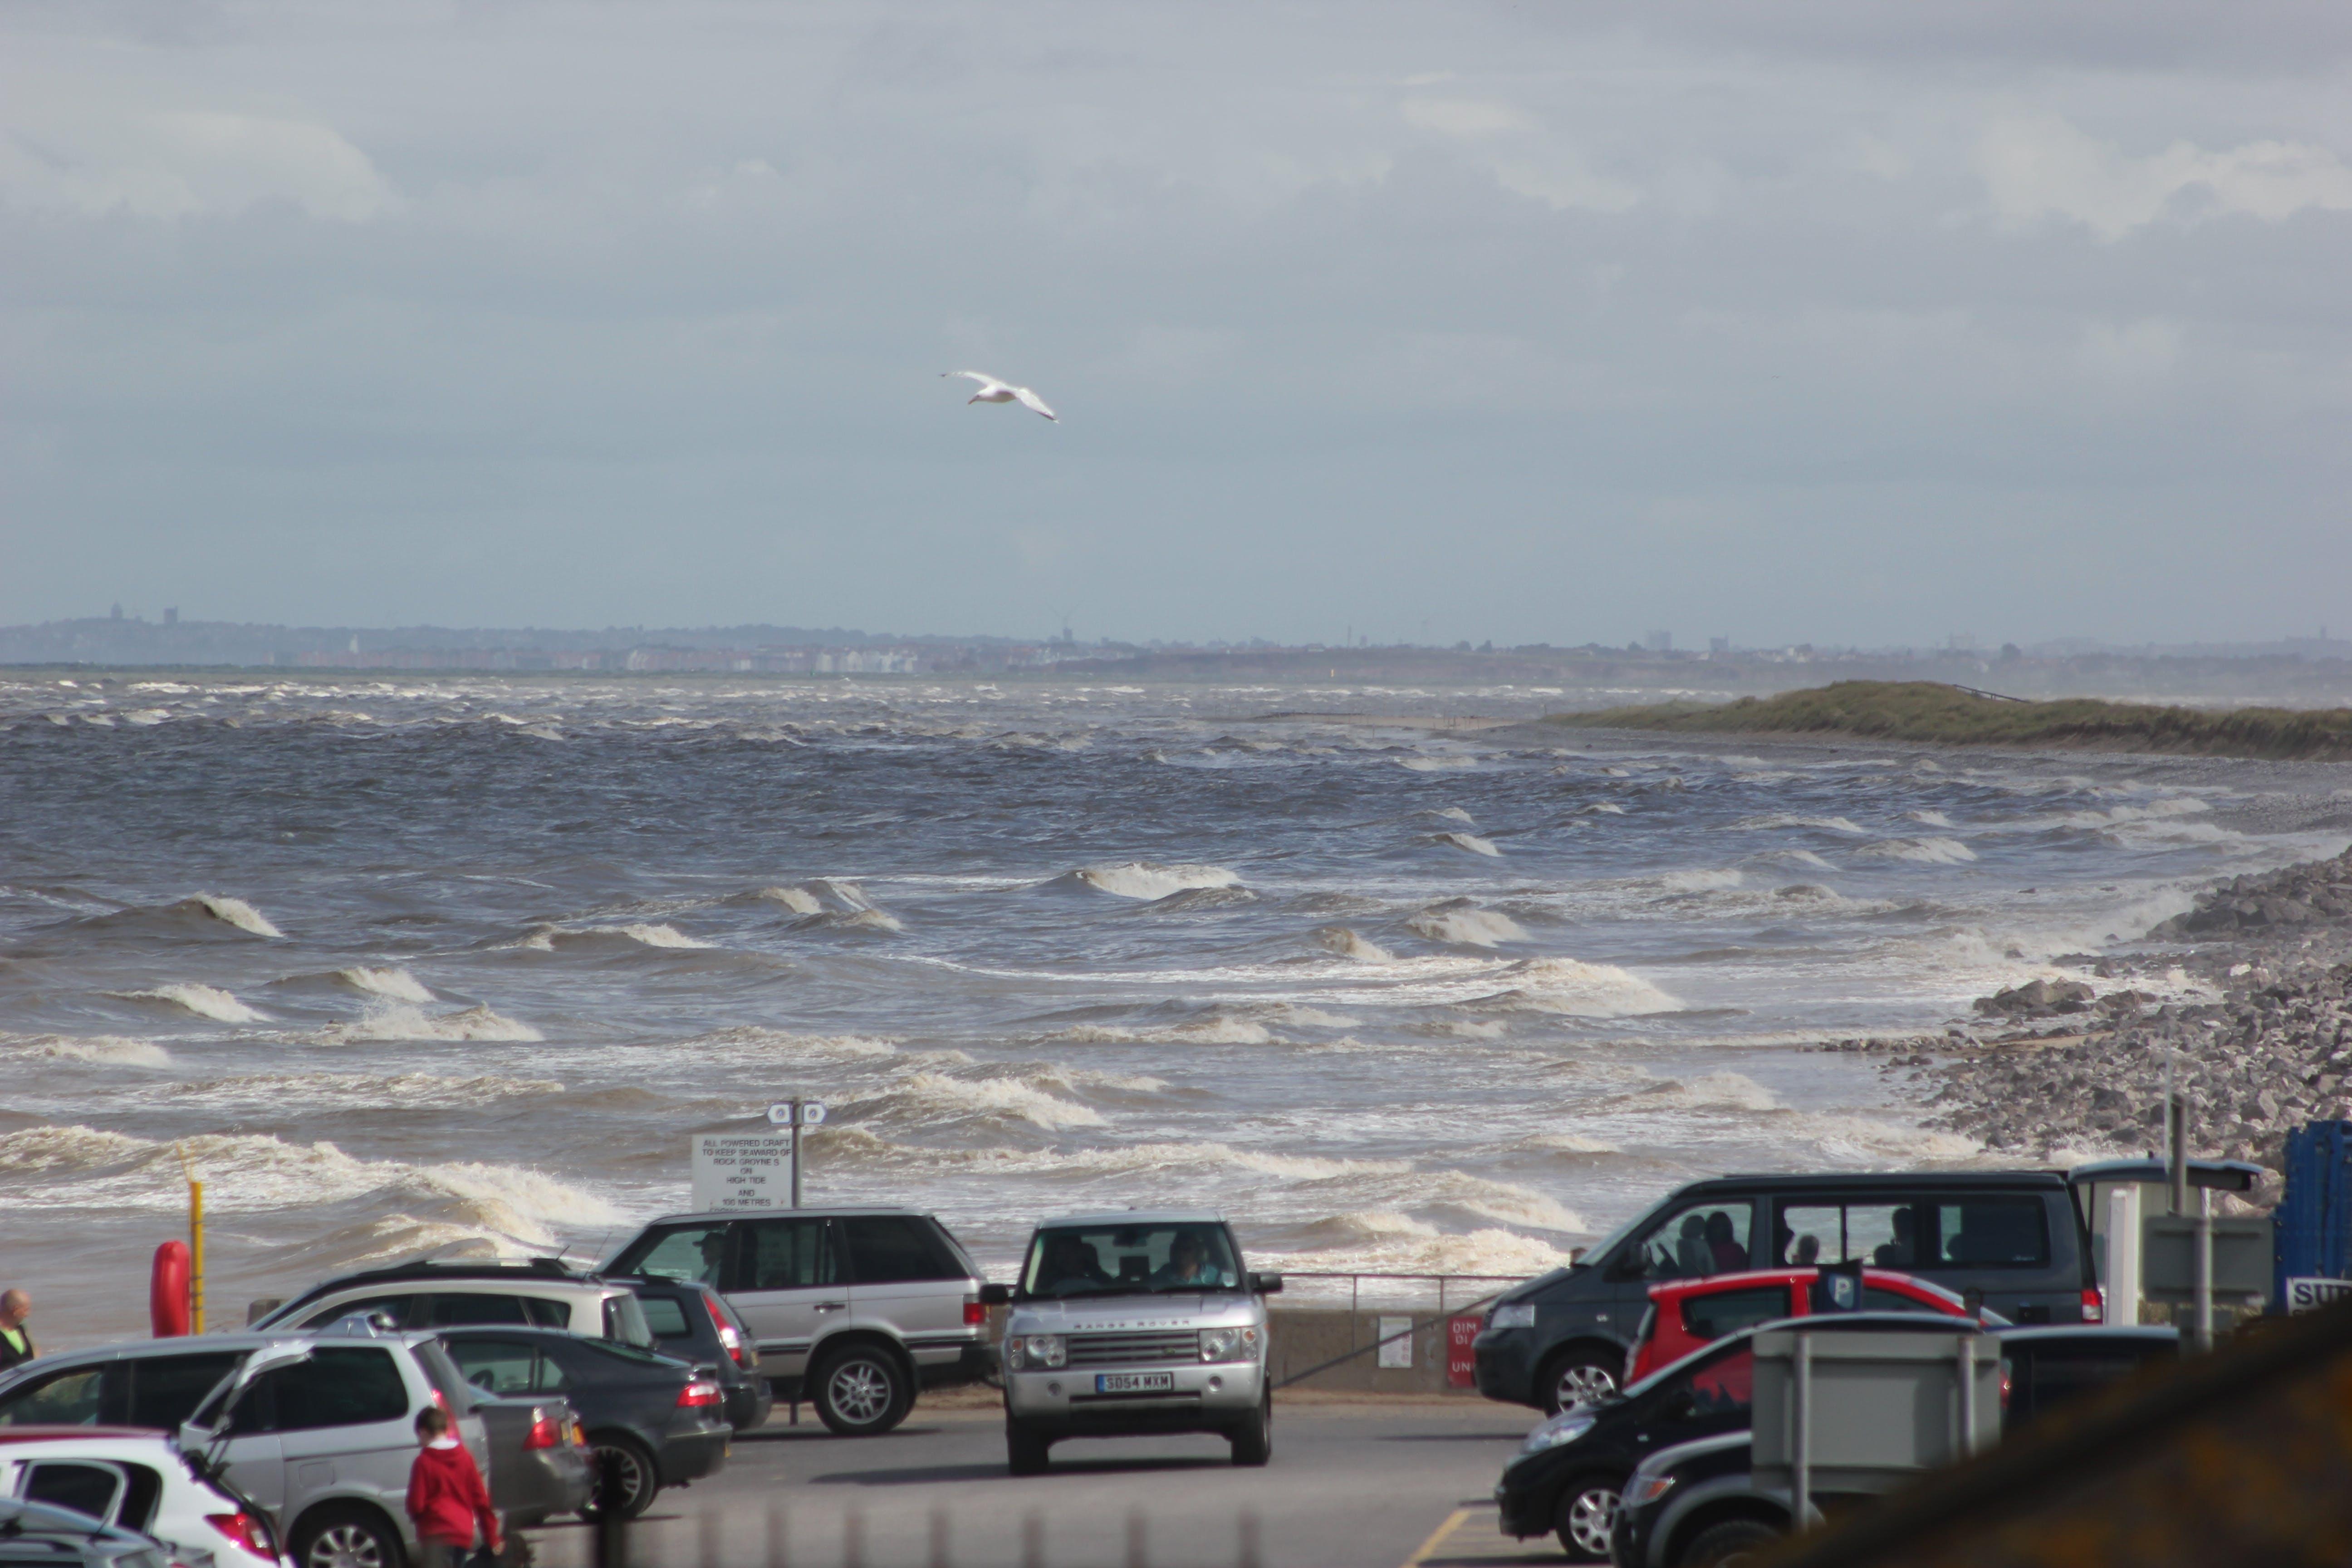 Free stock photo of beach, sea, seagulls, wave crashing